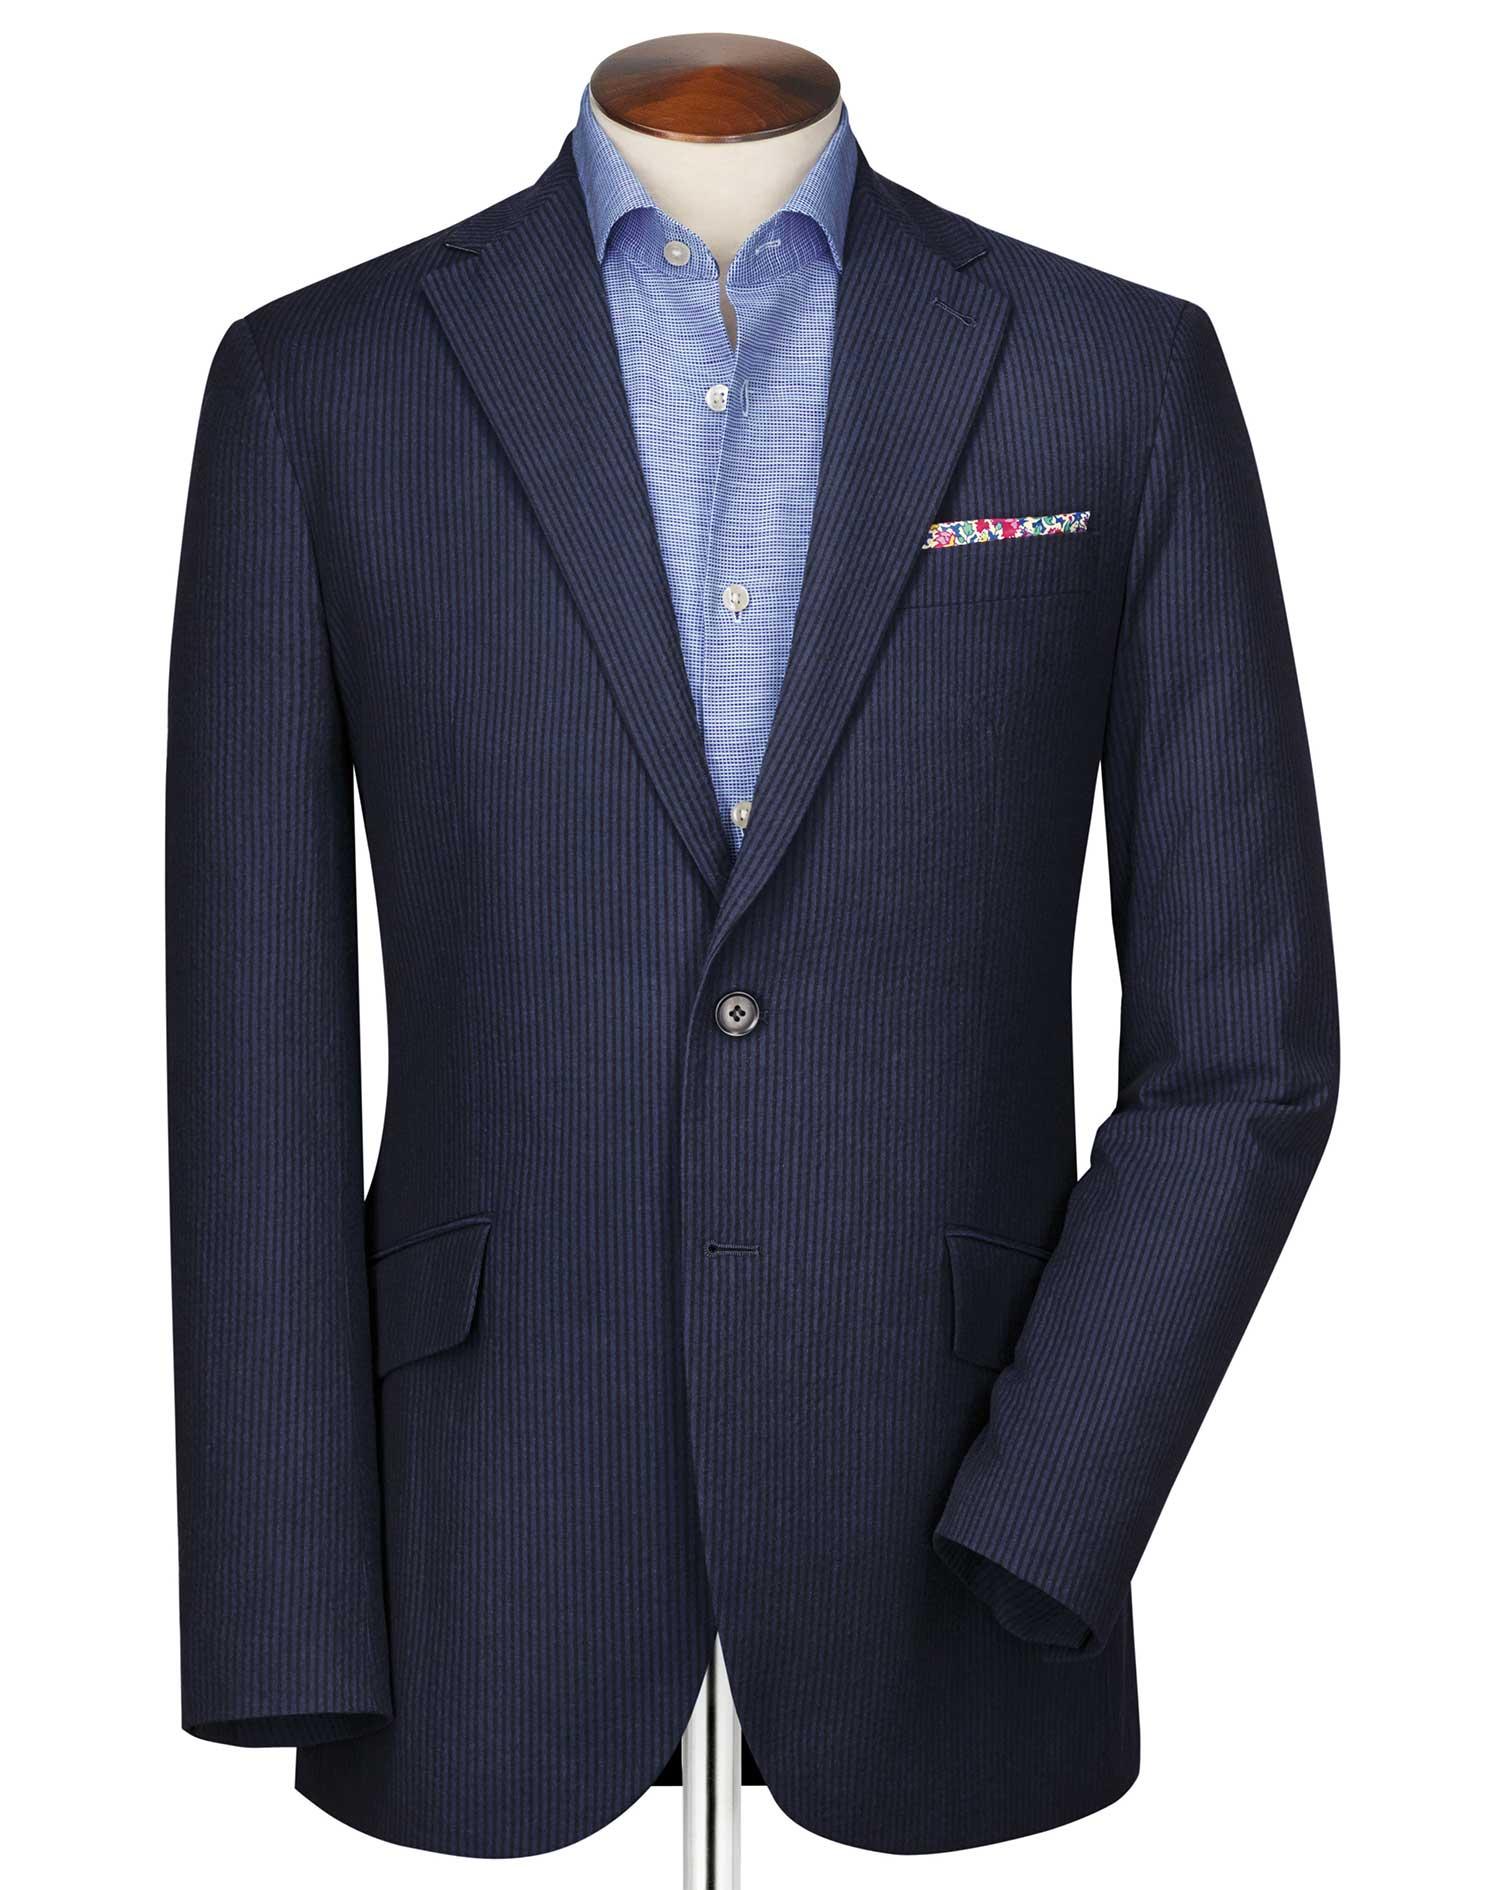 Slim Fit Black and Blue Stripe Seersucker Cotton Jacket Size 36 Regular by Charles Tyrwhitt